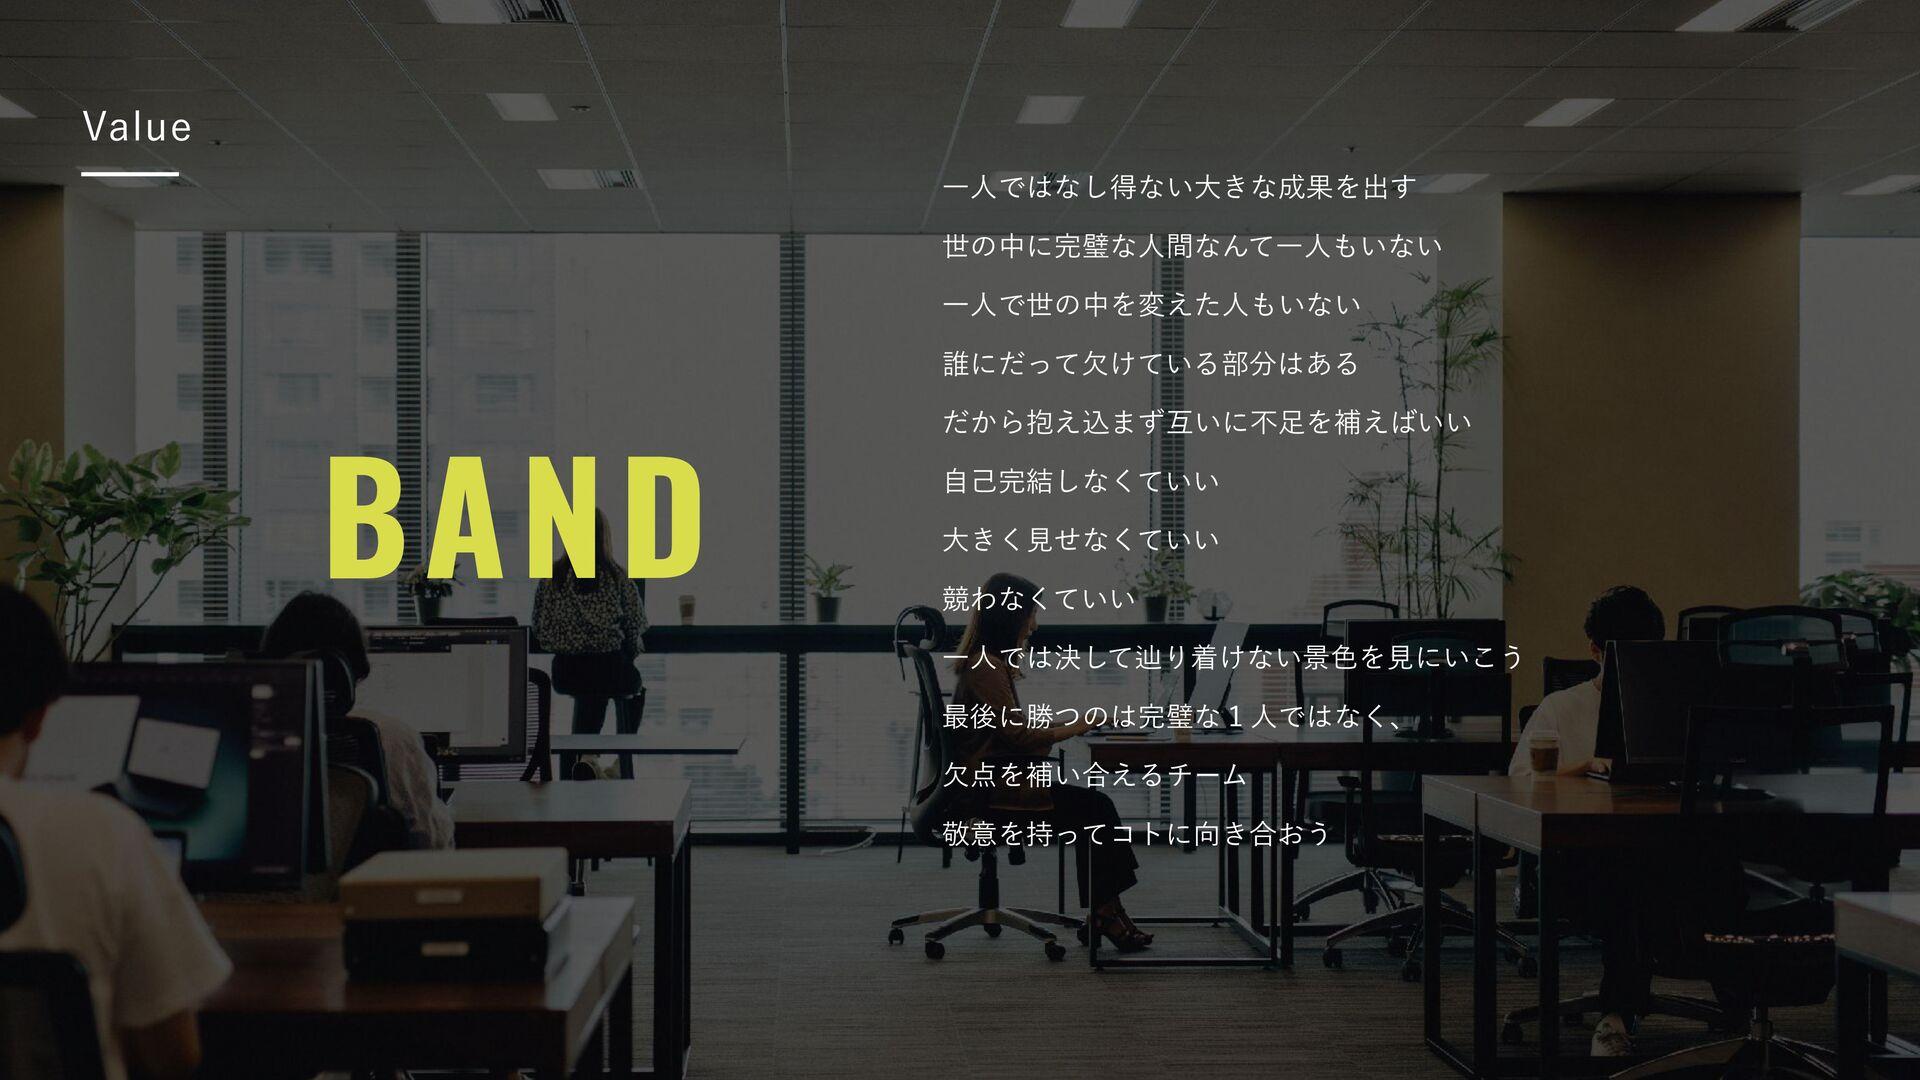 Recruit ʲɹ࠾༻ใɹʳ R O X X ' s d i s c o g r a p ...